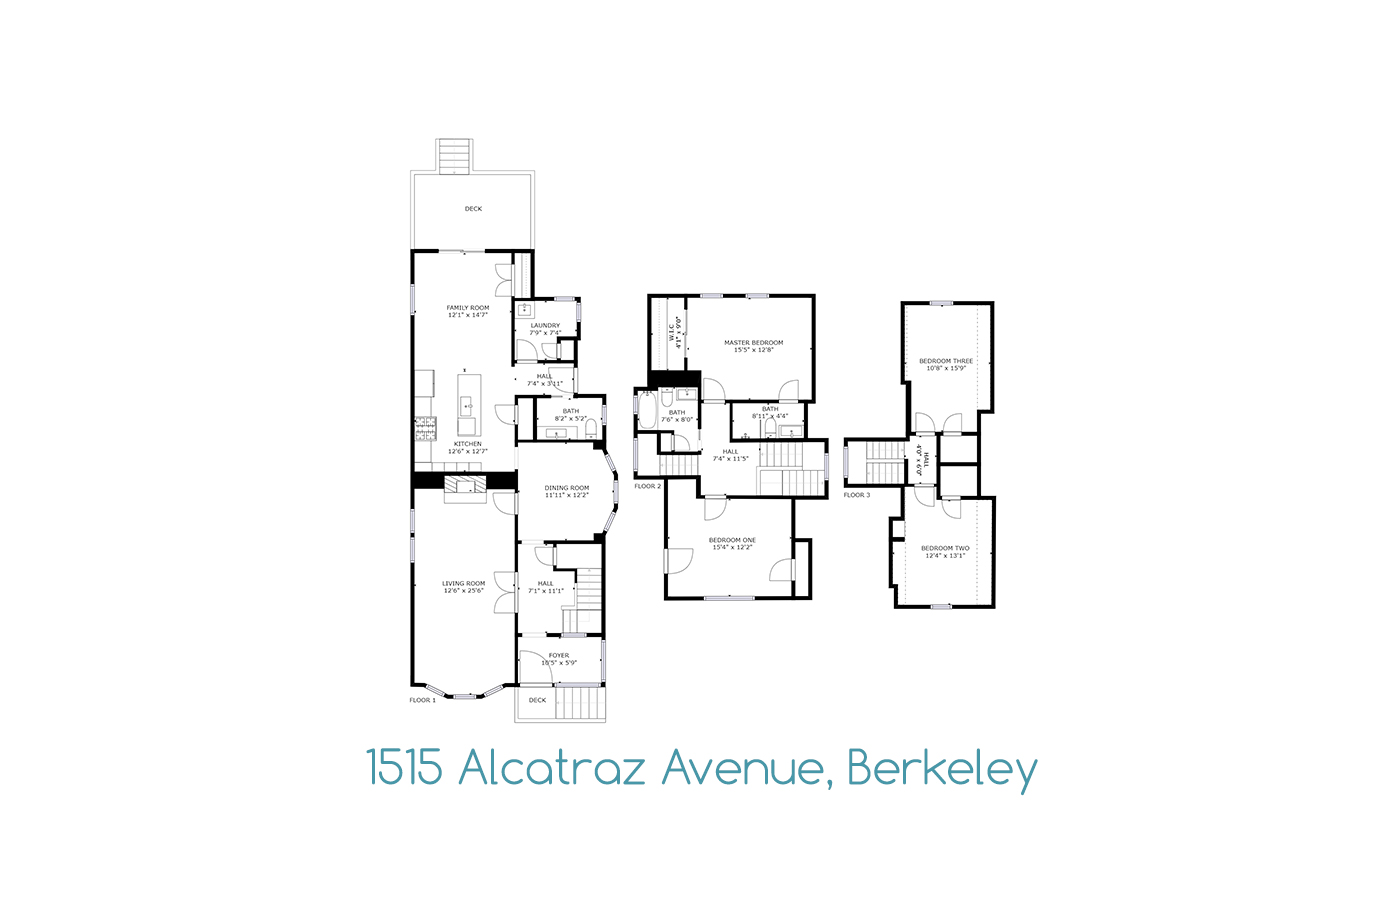 1515 Alcatraz Avenue Berkeley Ca 94703 Abio Properties